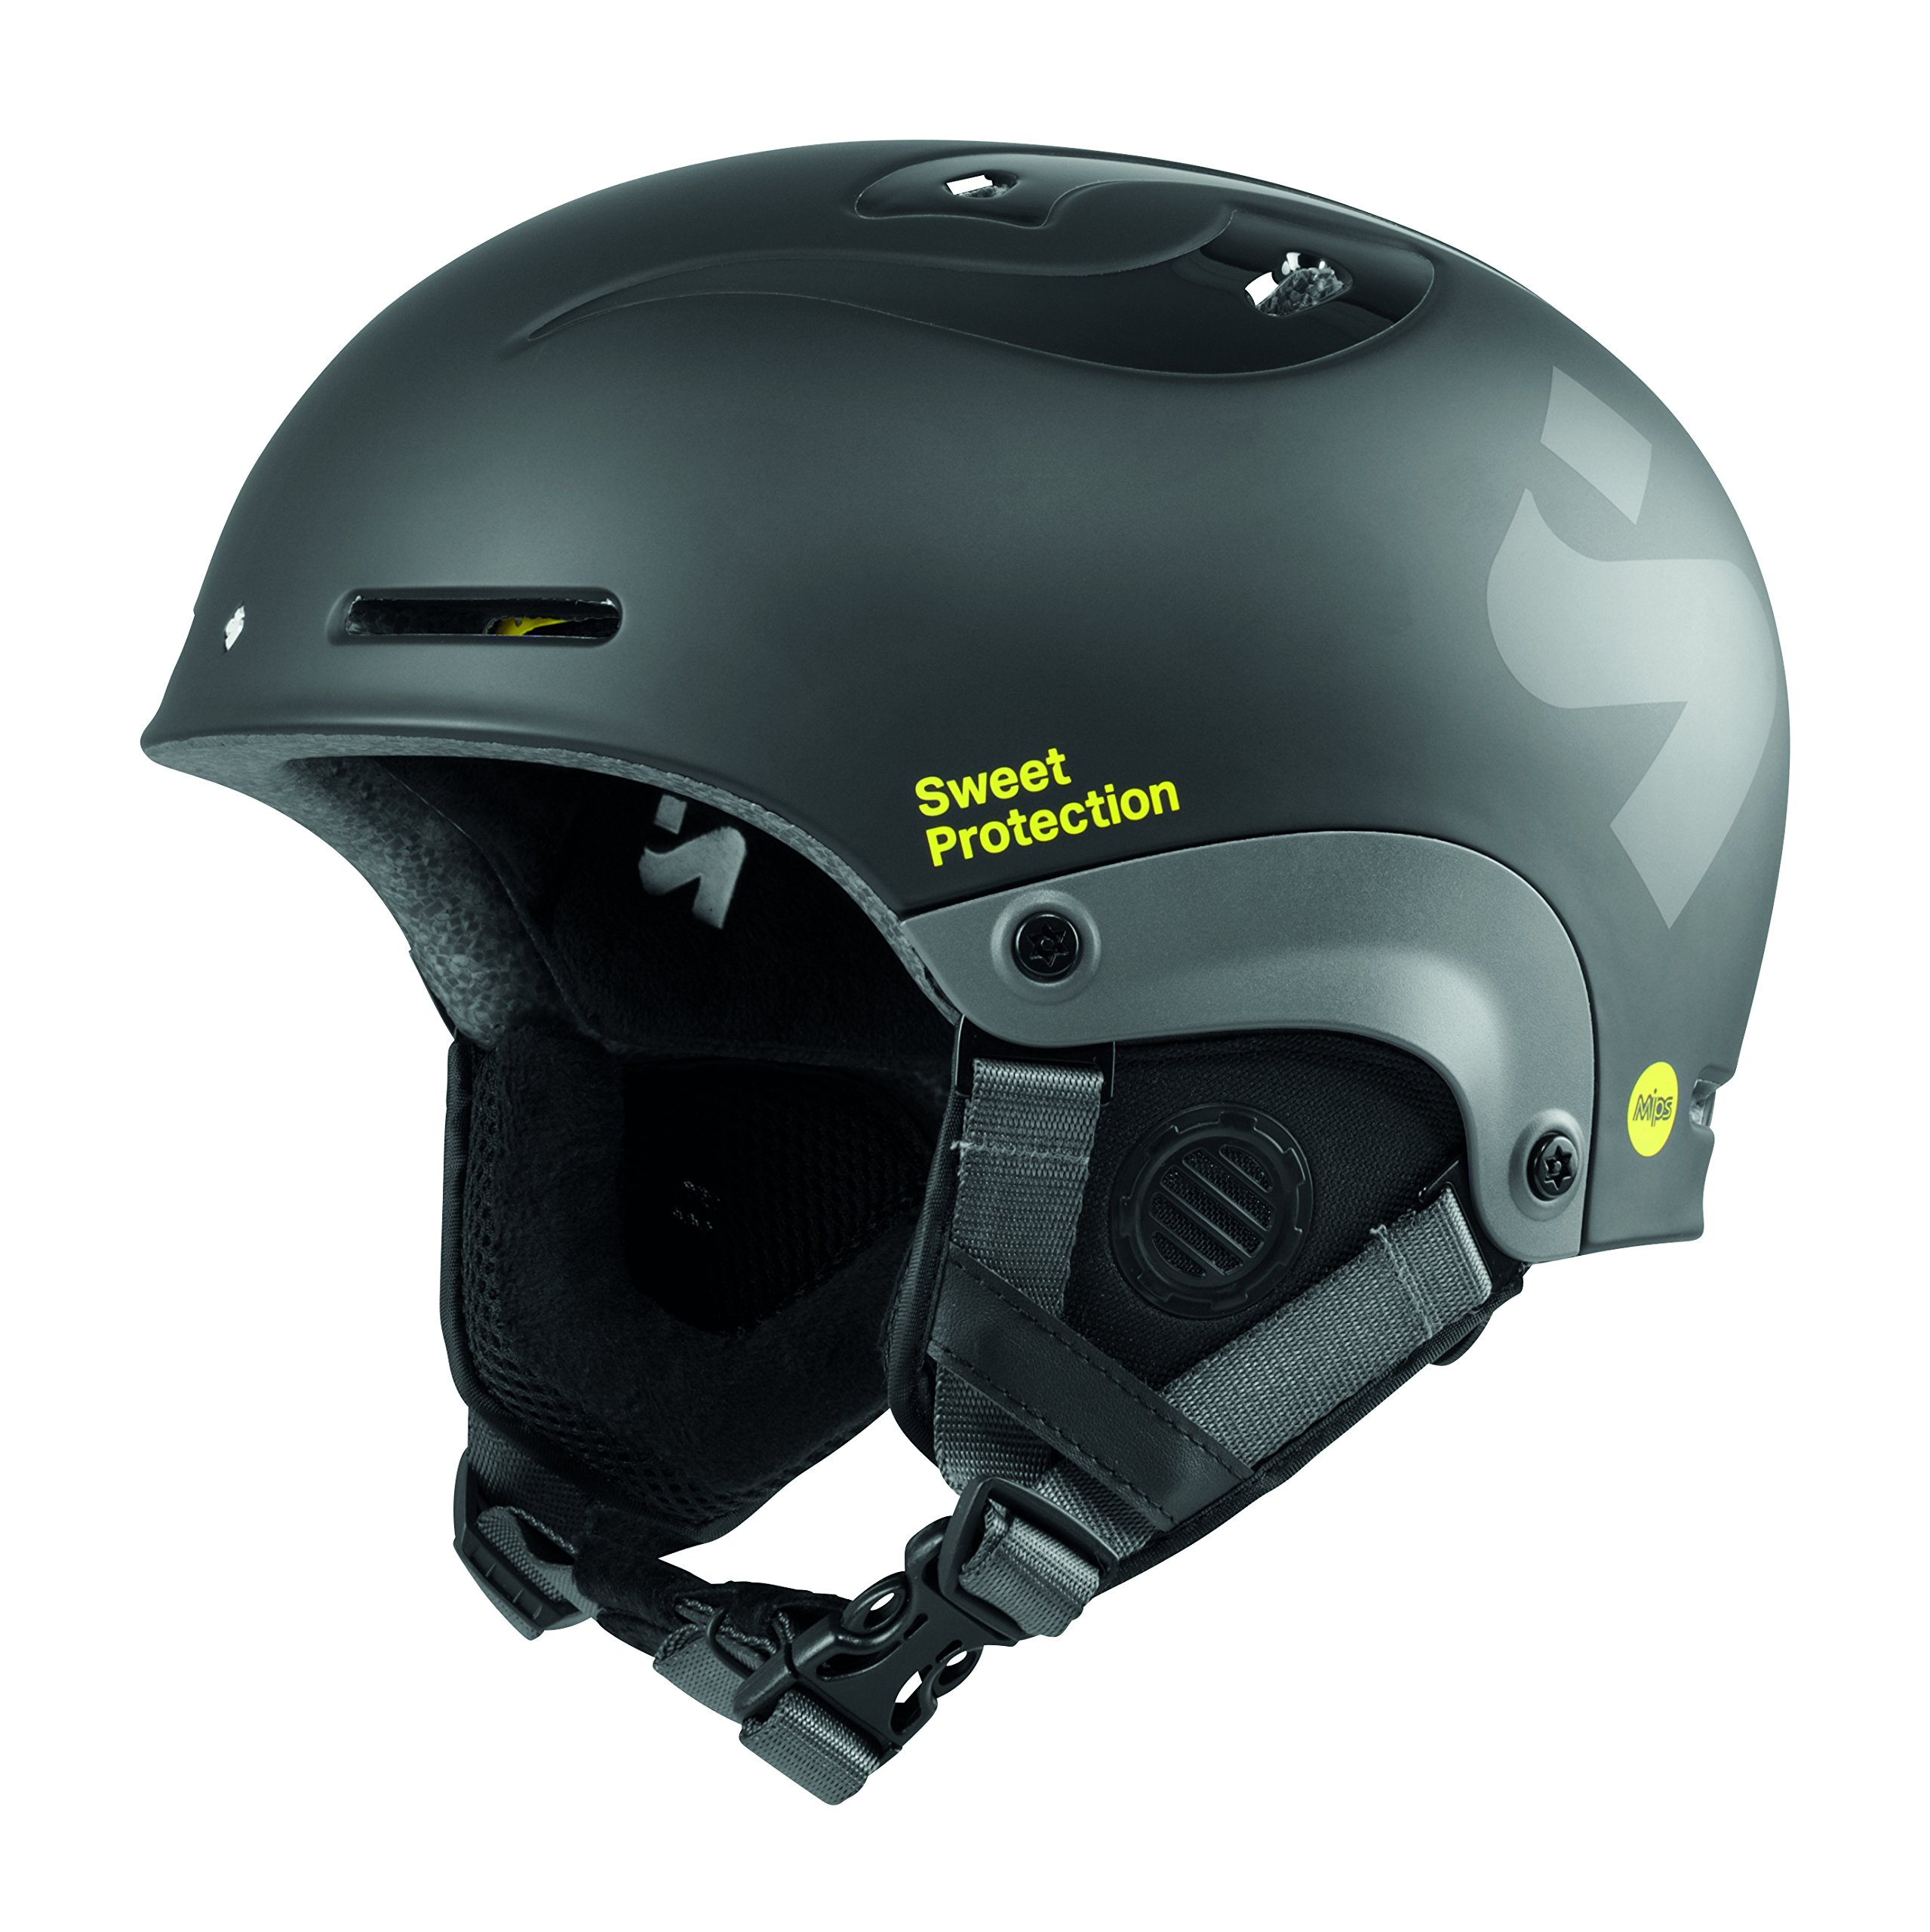 Sweet Protection Unisex Jugend Blaster II MIPS Helmet JR Ski/Snowboard, Dirt Bla